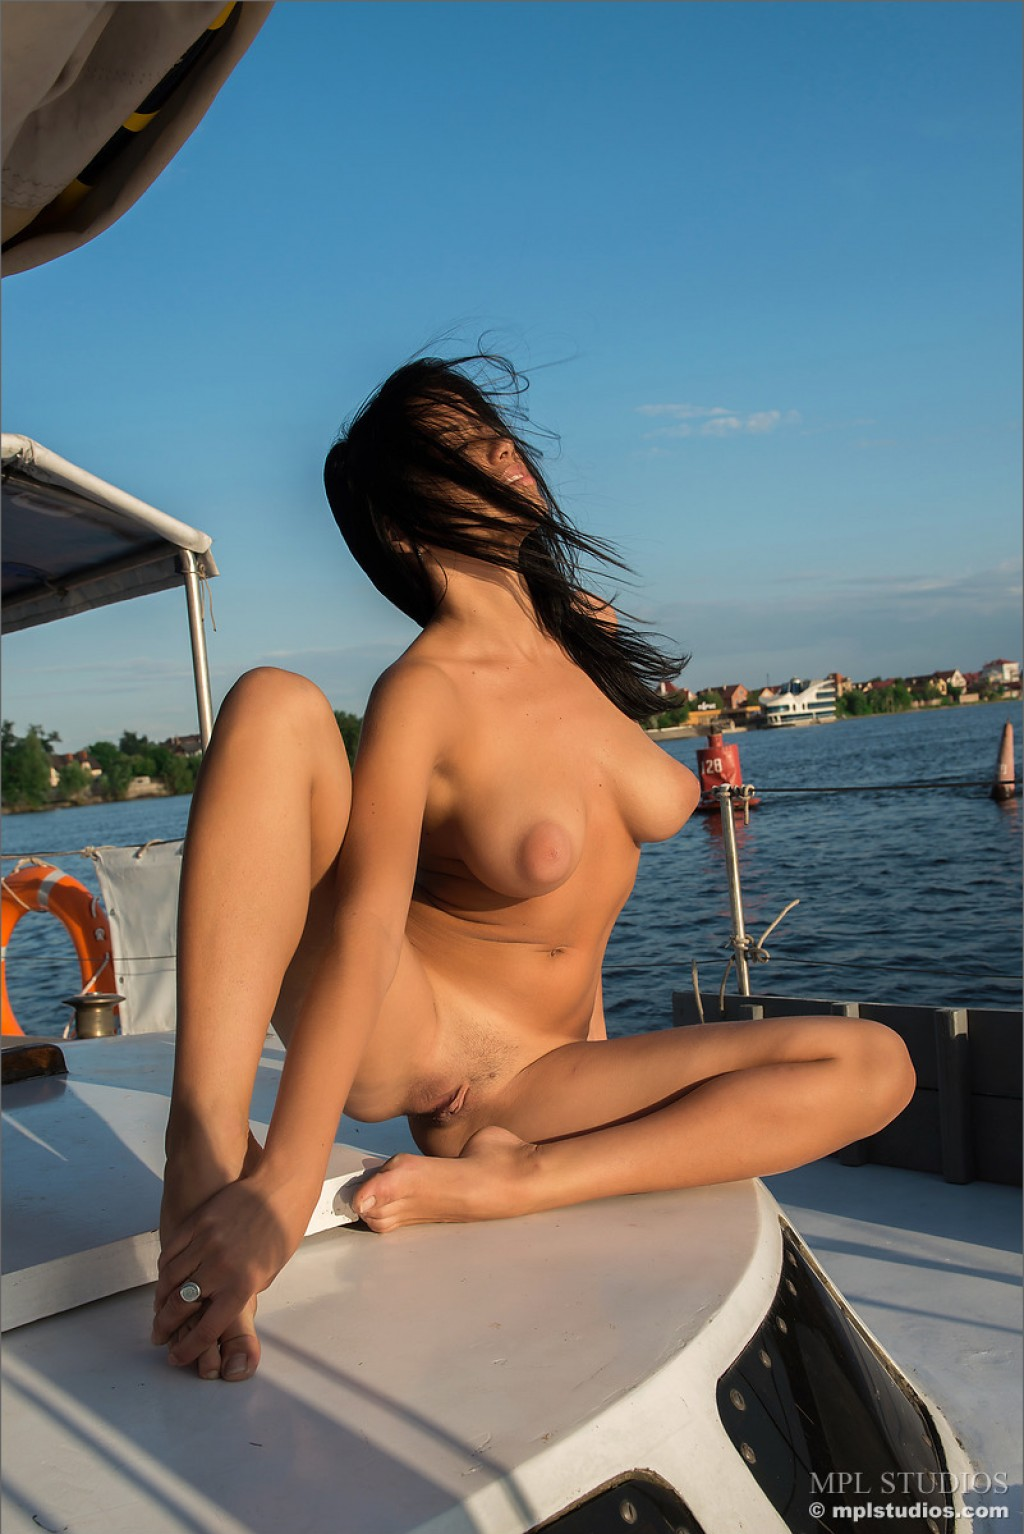 Taija nude pics in Calypso shot by Alexander Petek